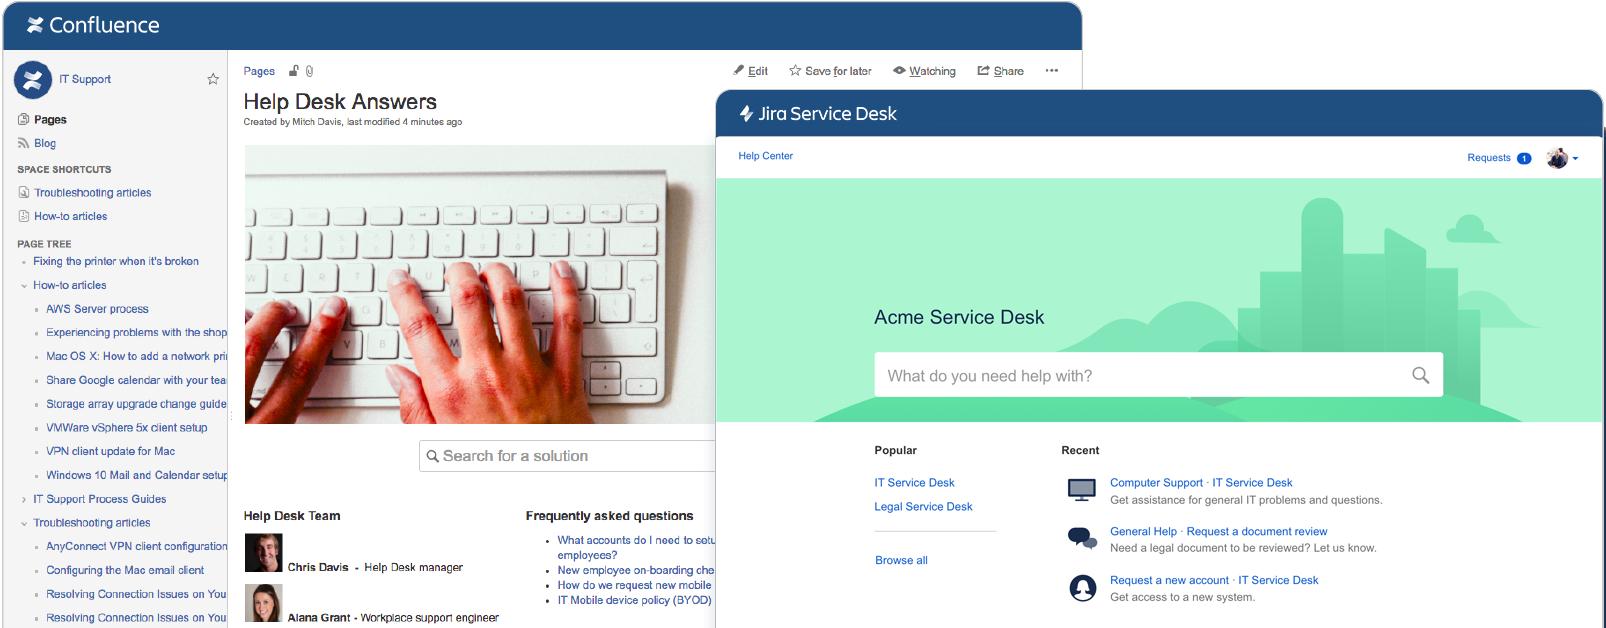 Confluence 和 Jira Service Desk 屏幕截图